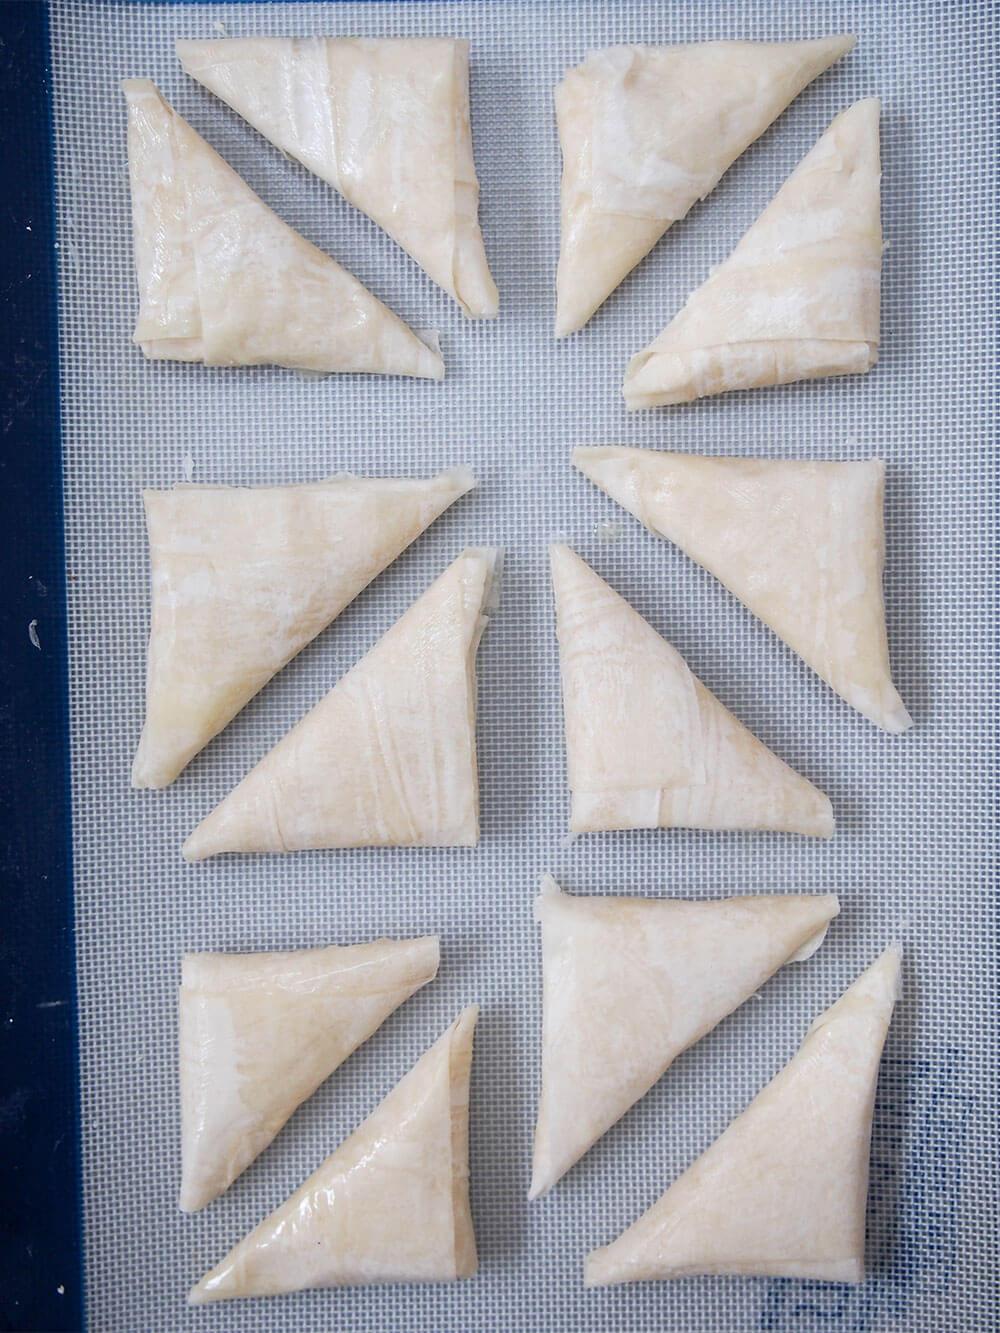 tiropita Greek cheese pastries ready to bake